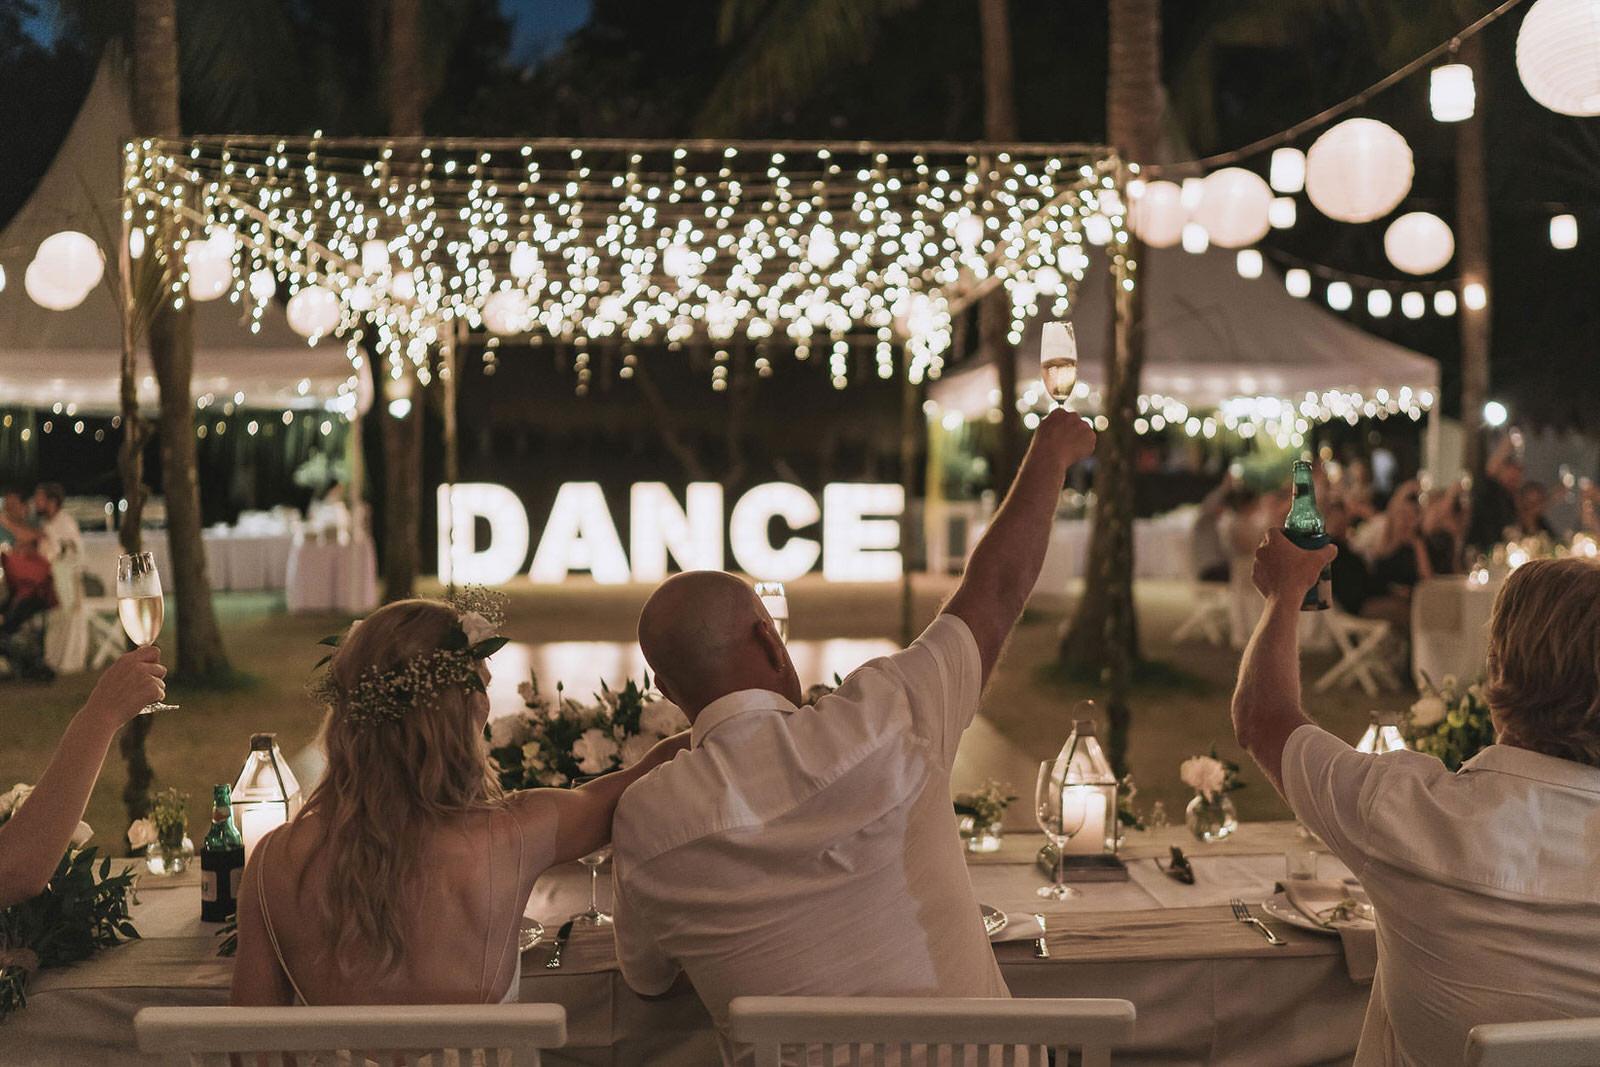 newfound-hai-tide-nusa-lembongan-bali-wedding-photographers-155